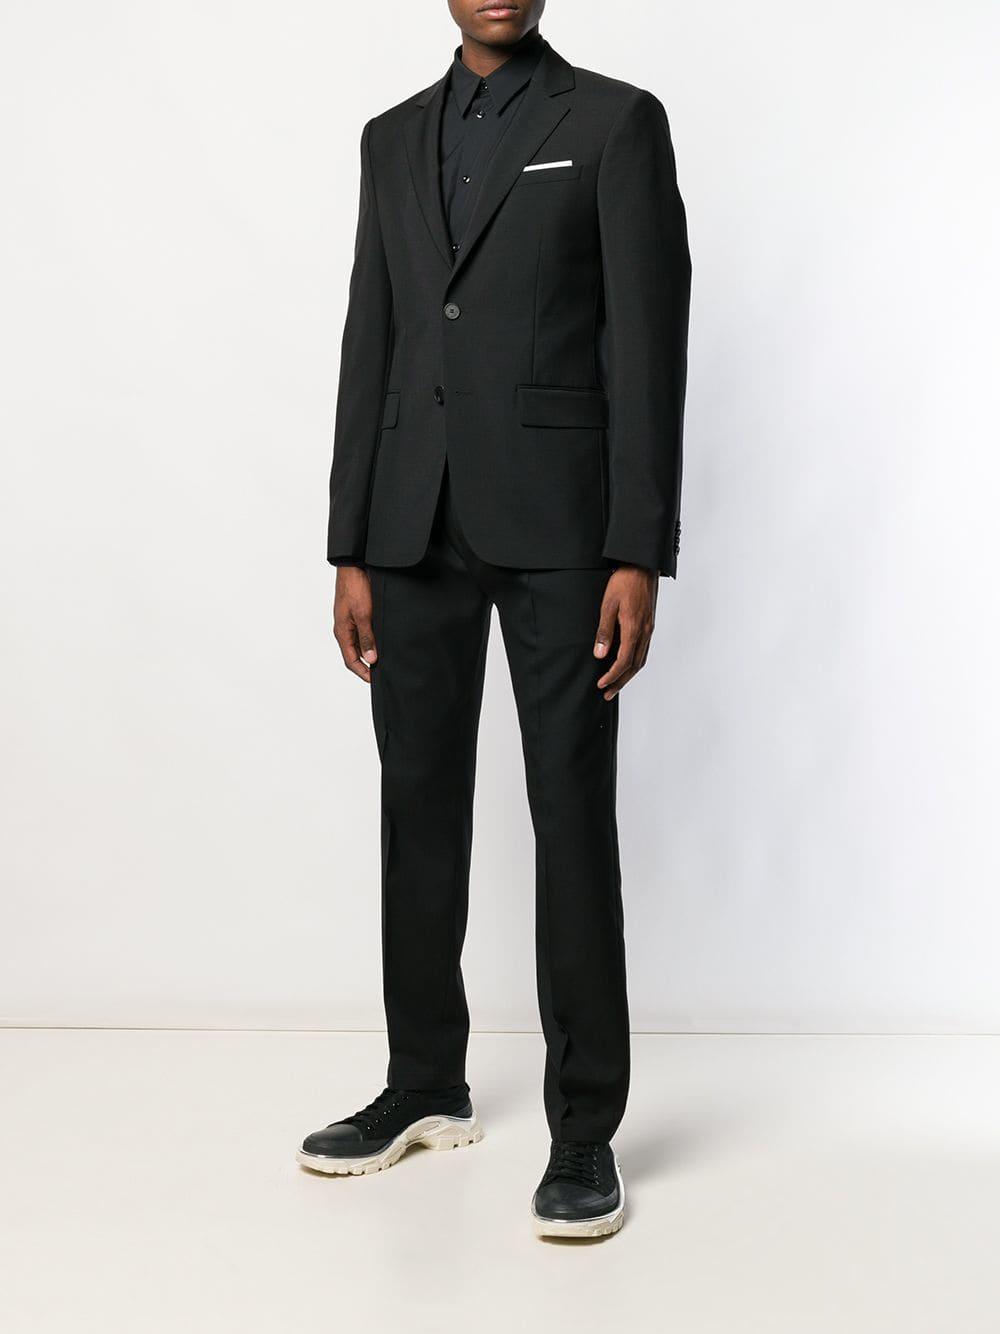 248e7da8845 Givenchy - Black Рубашка С Длинными Рукавами for Men - Lyst. На весь экран